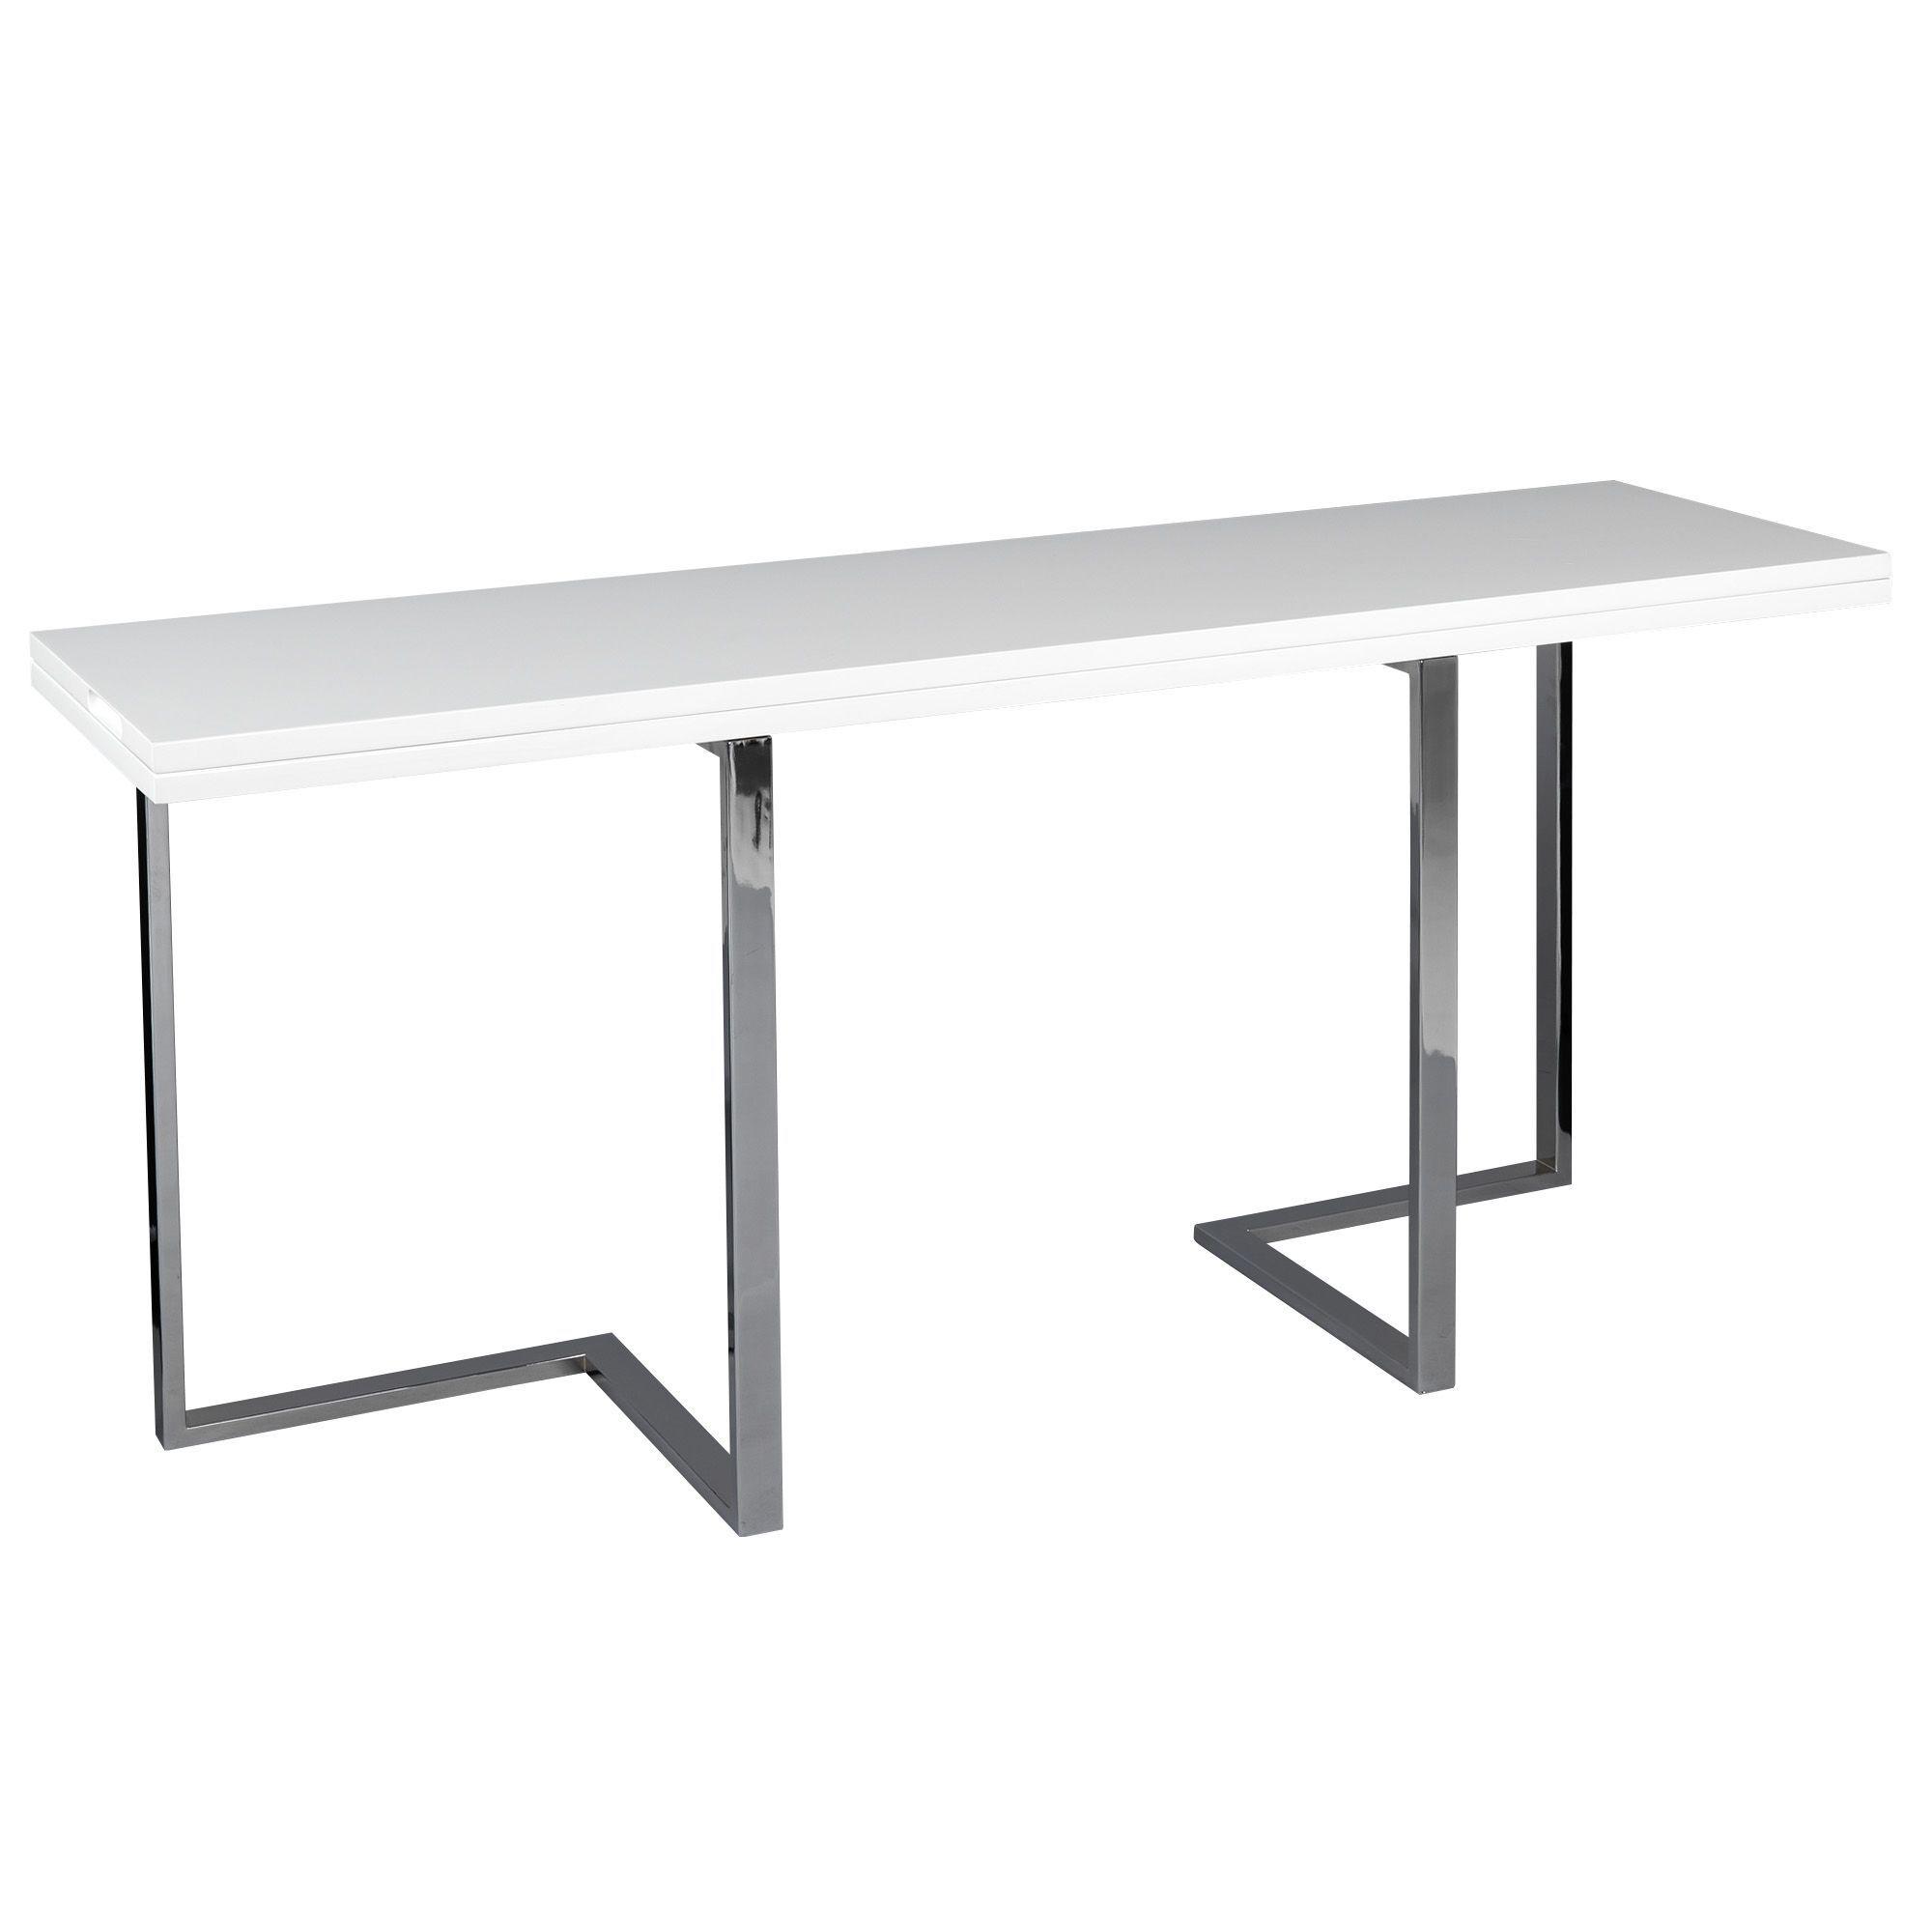 Table Pliante Extensible: Console Extensible En Table De Repas Blanc